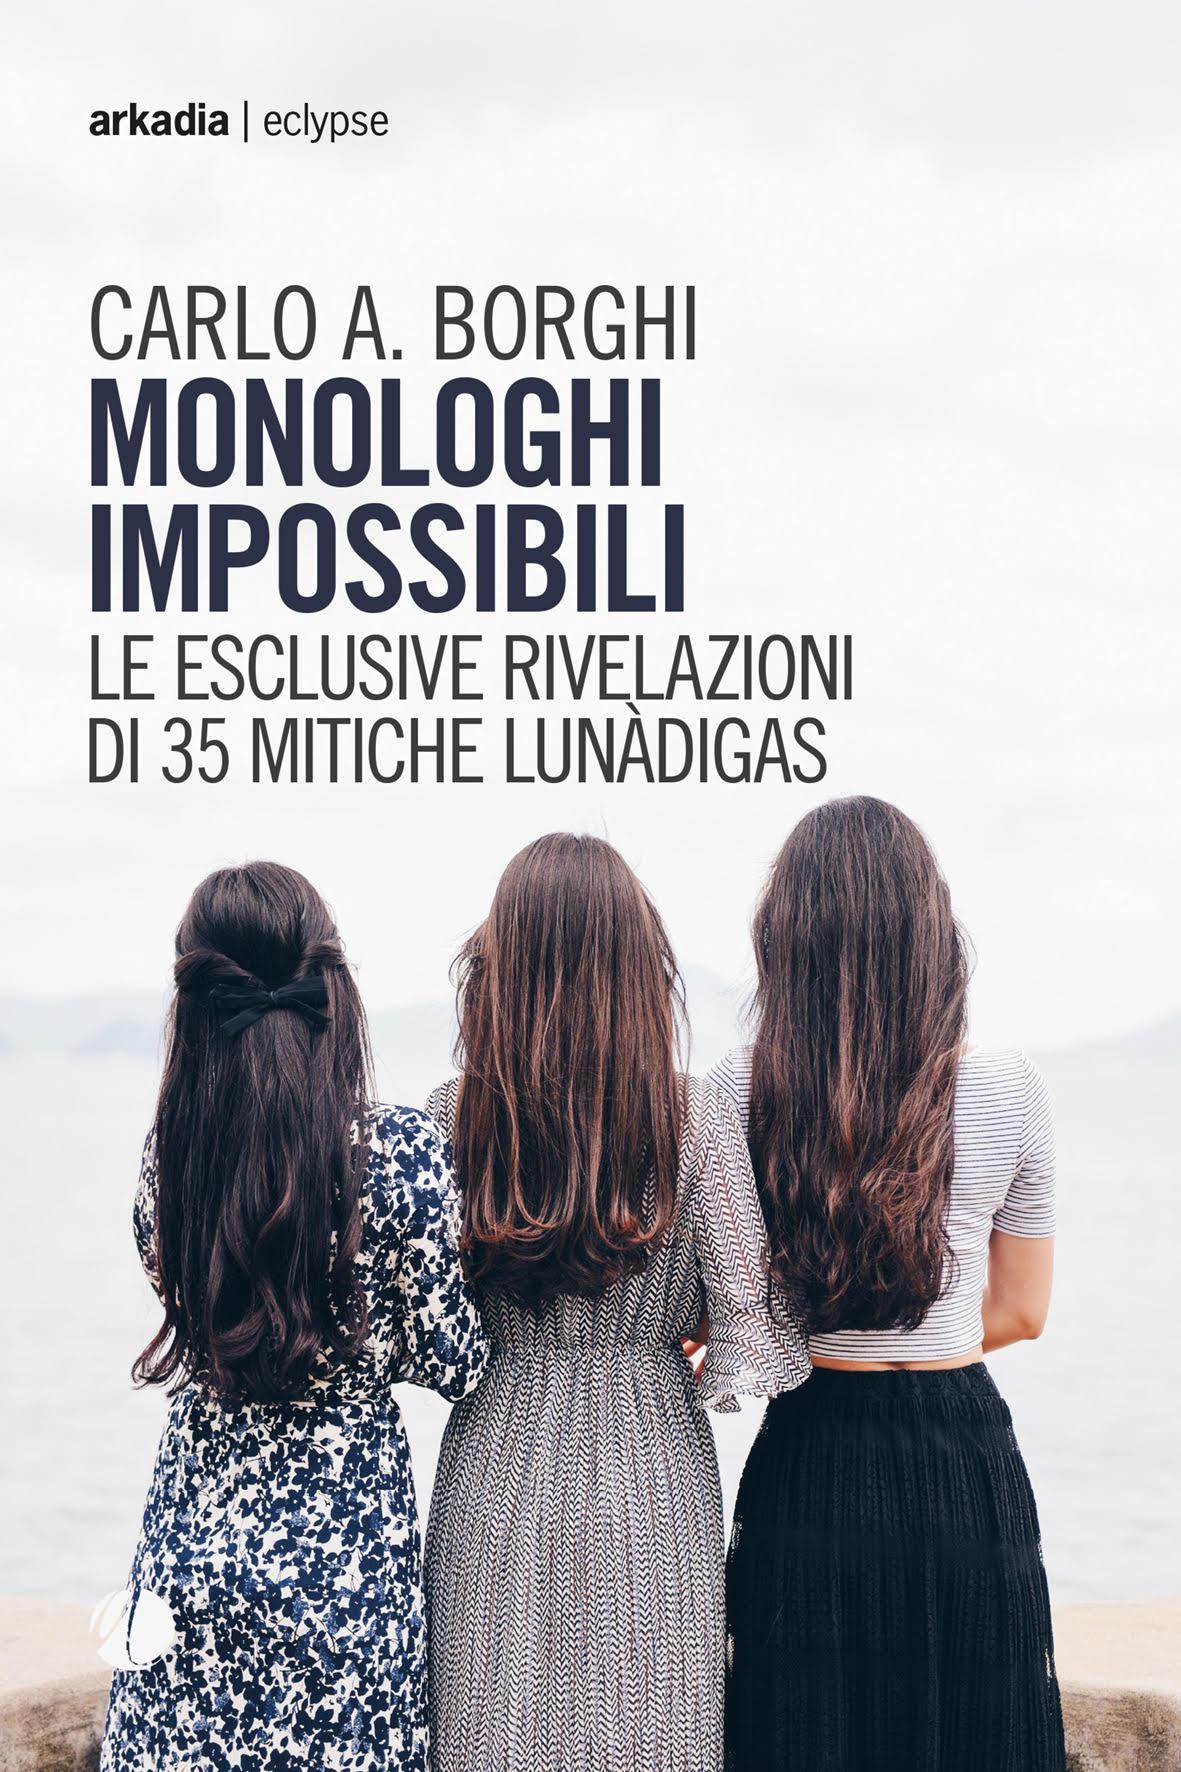 Monologhi-impossibili_1.jpg